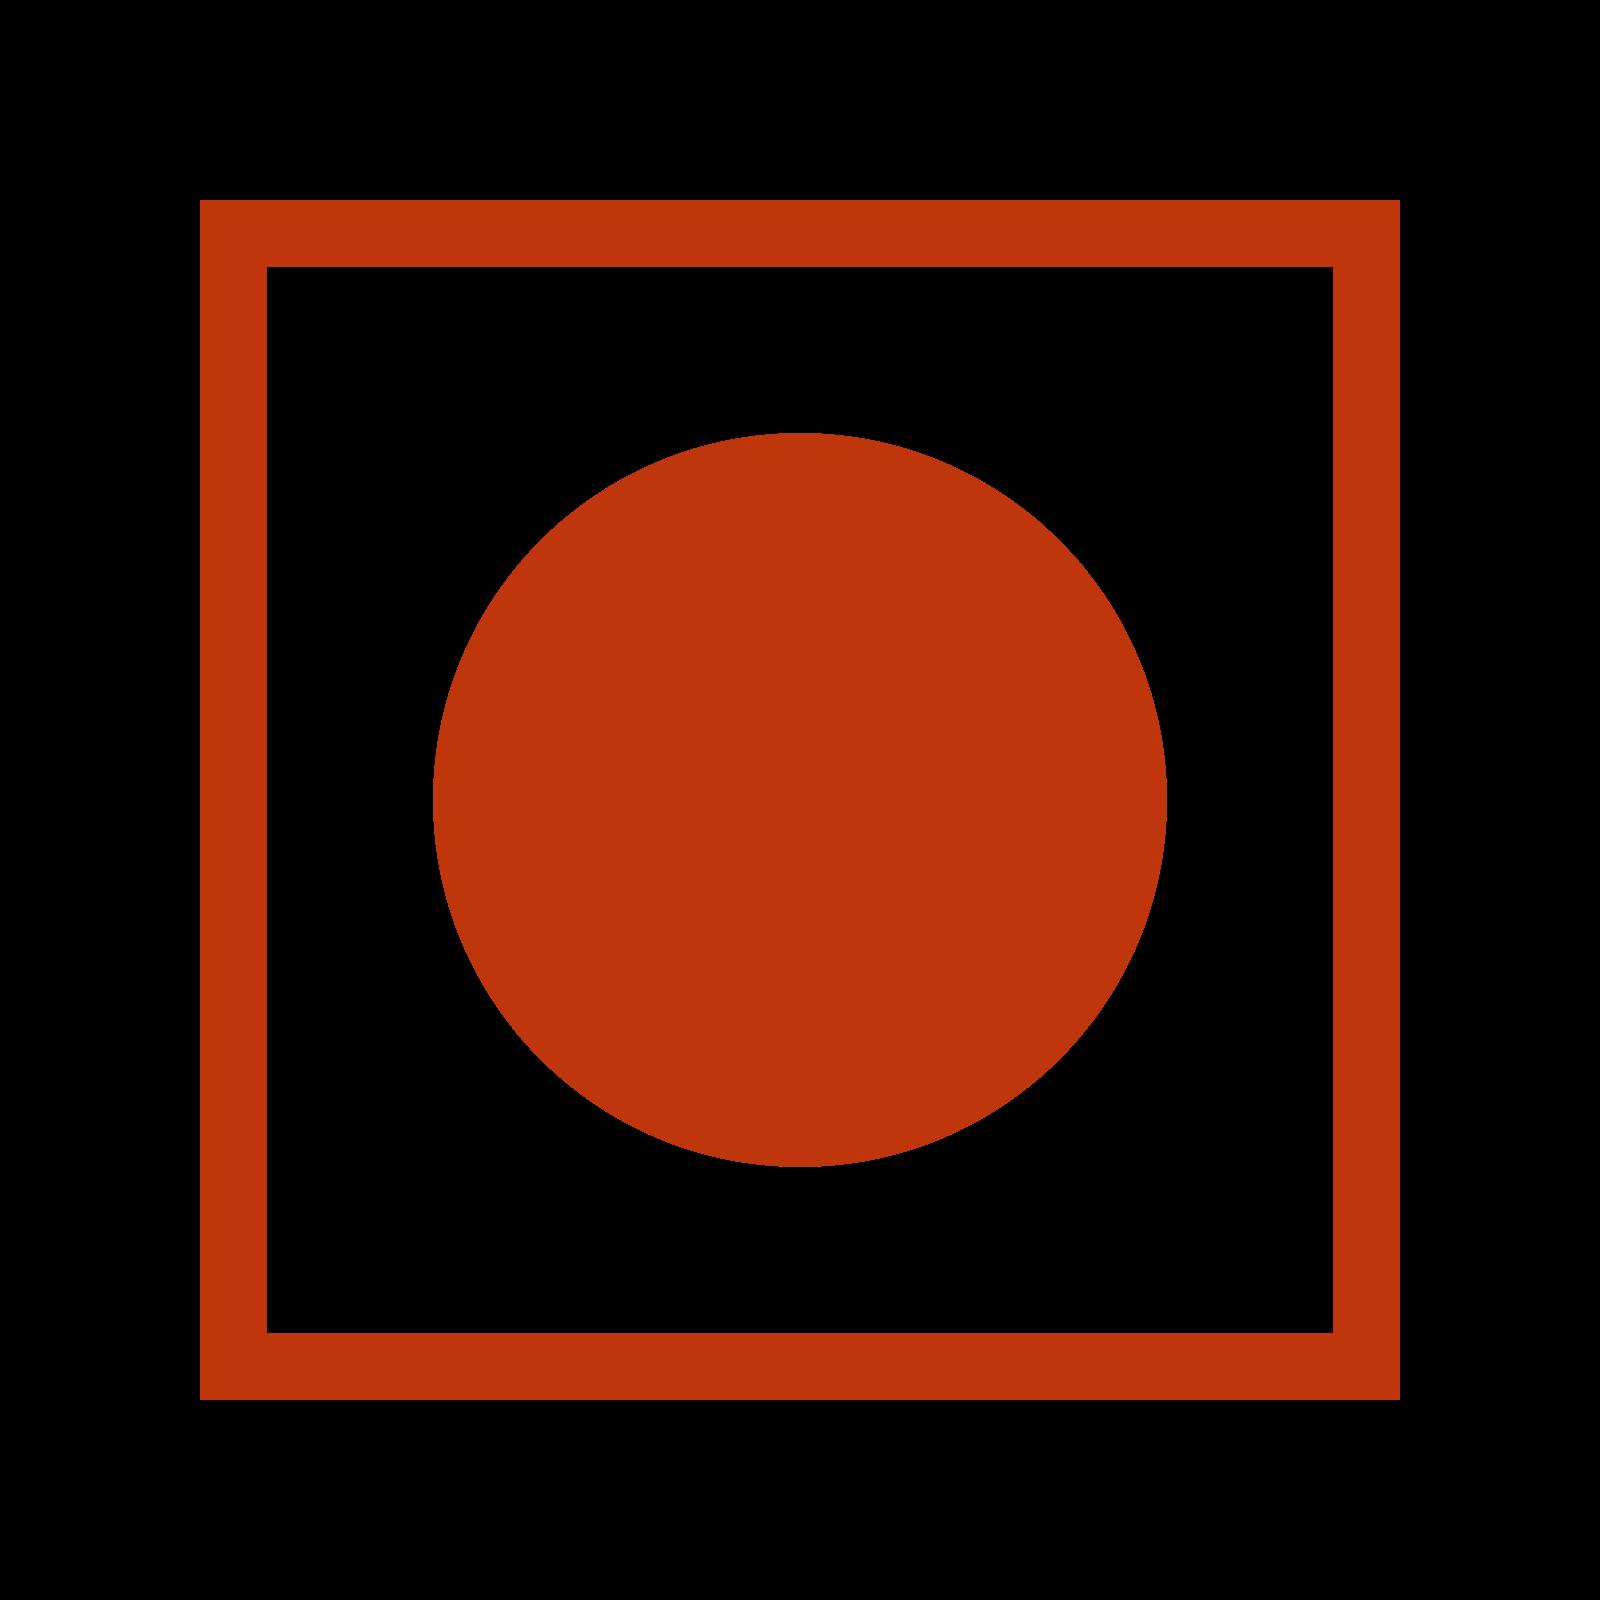 Non Vegetarian Food Symbol icon